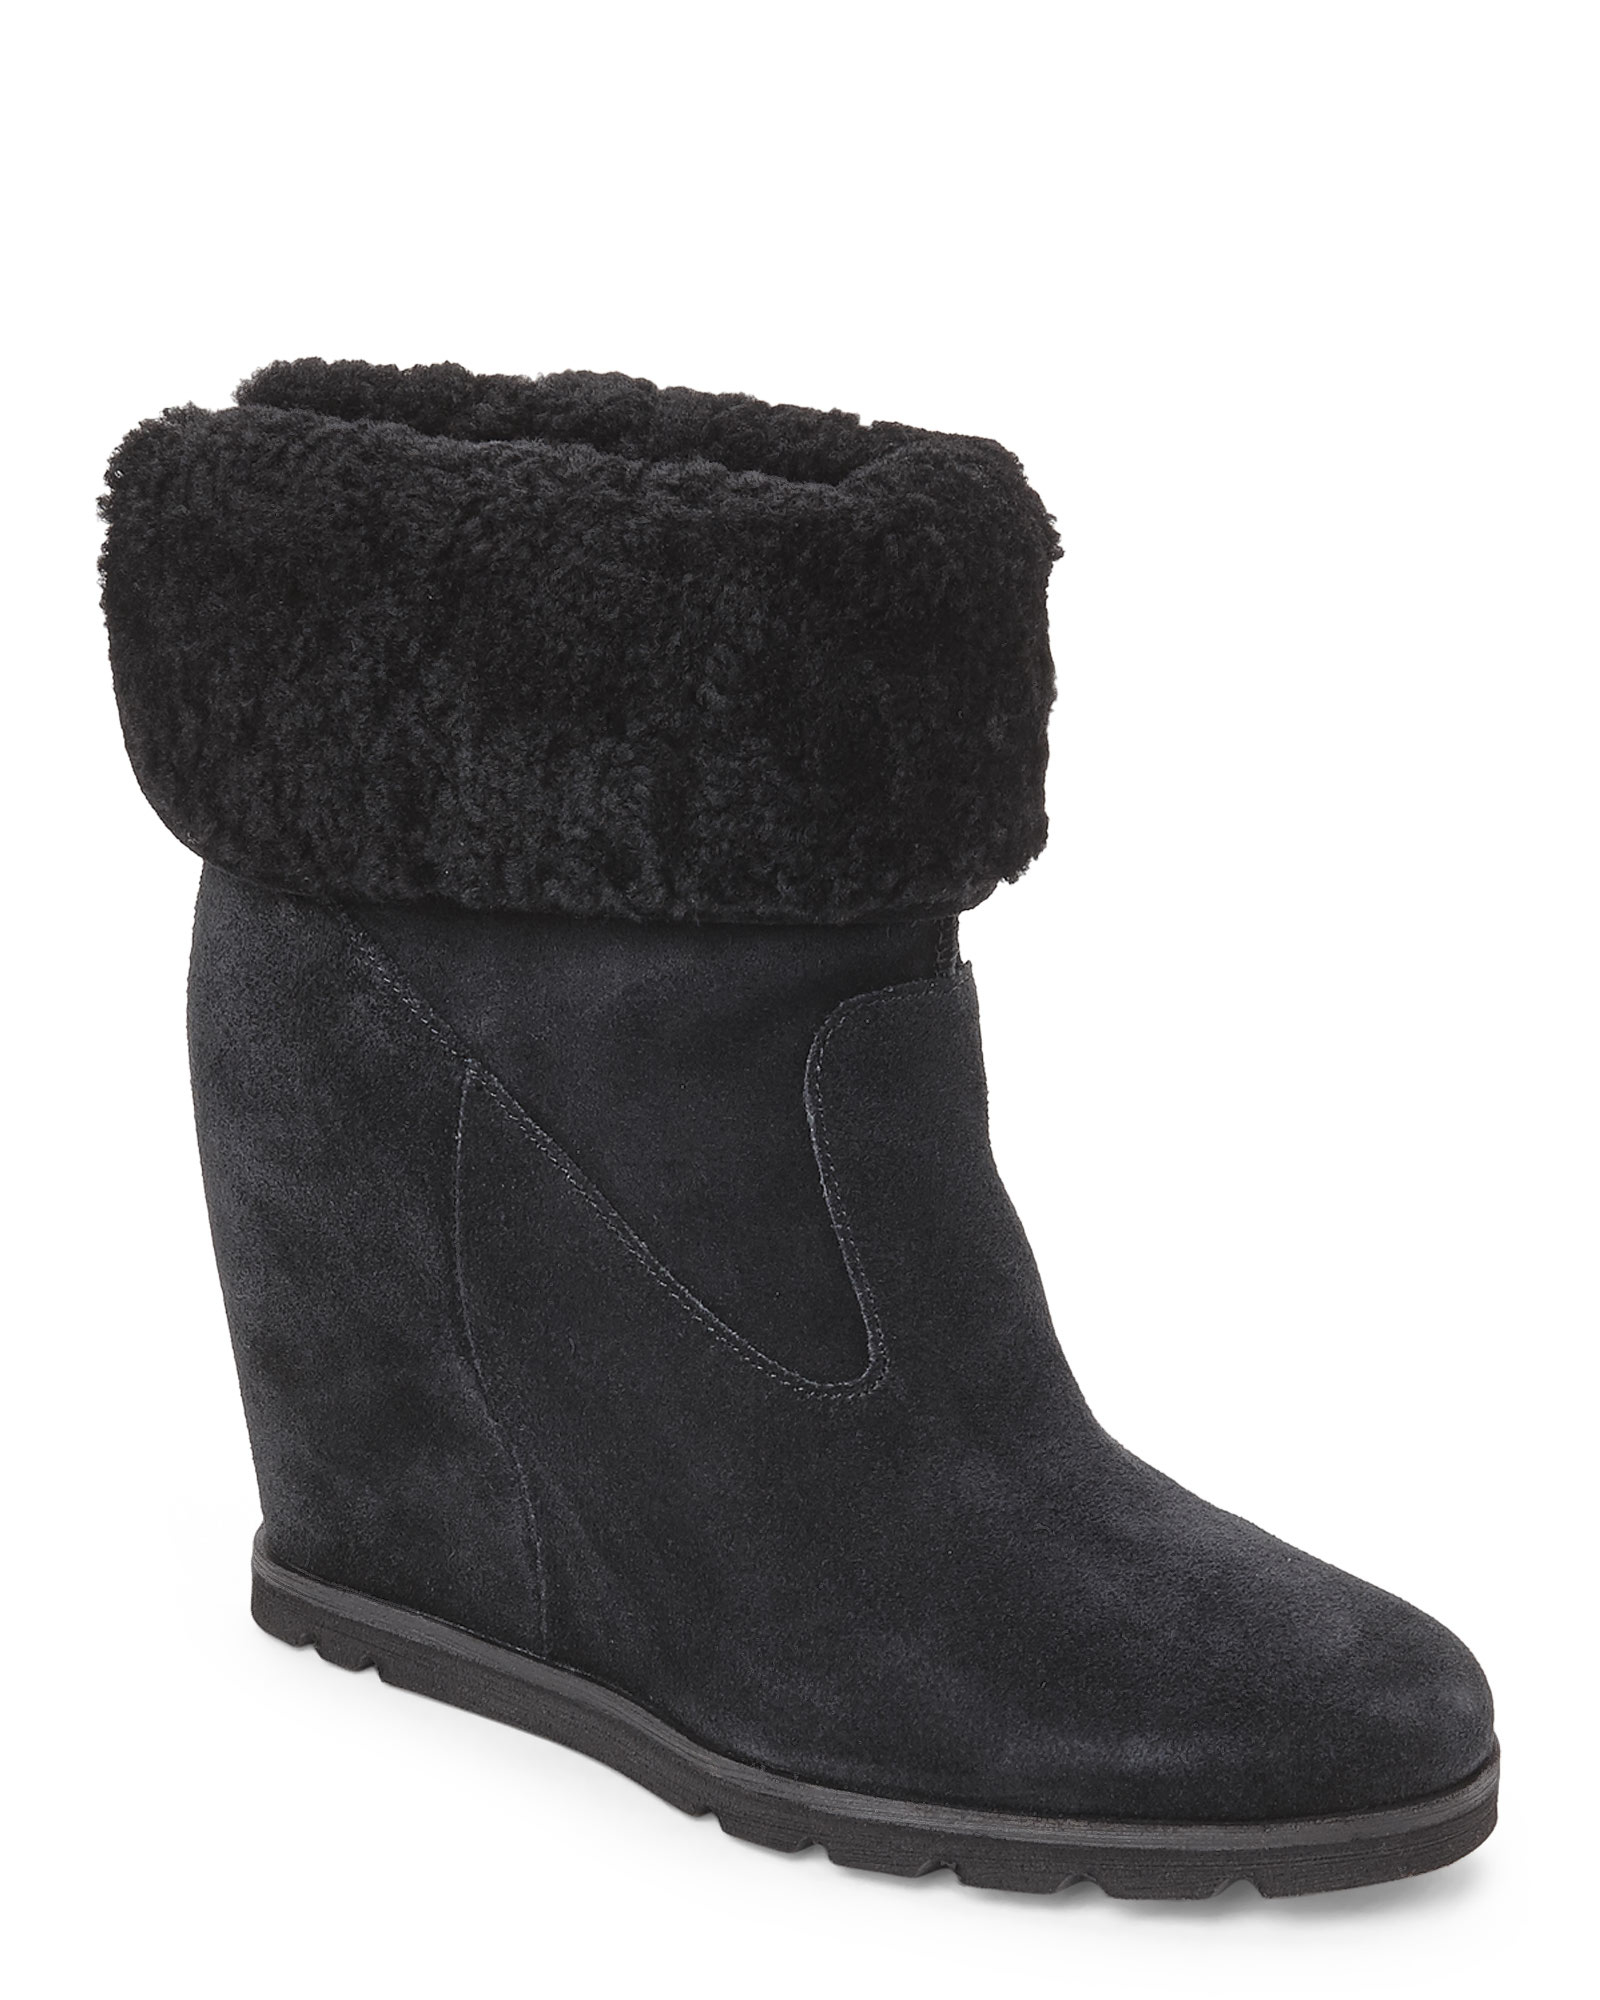 347e9129d6b UGG Black Kyra Wedge Boots